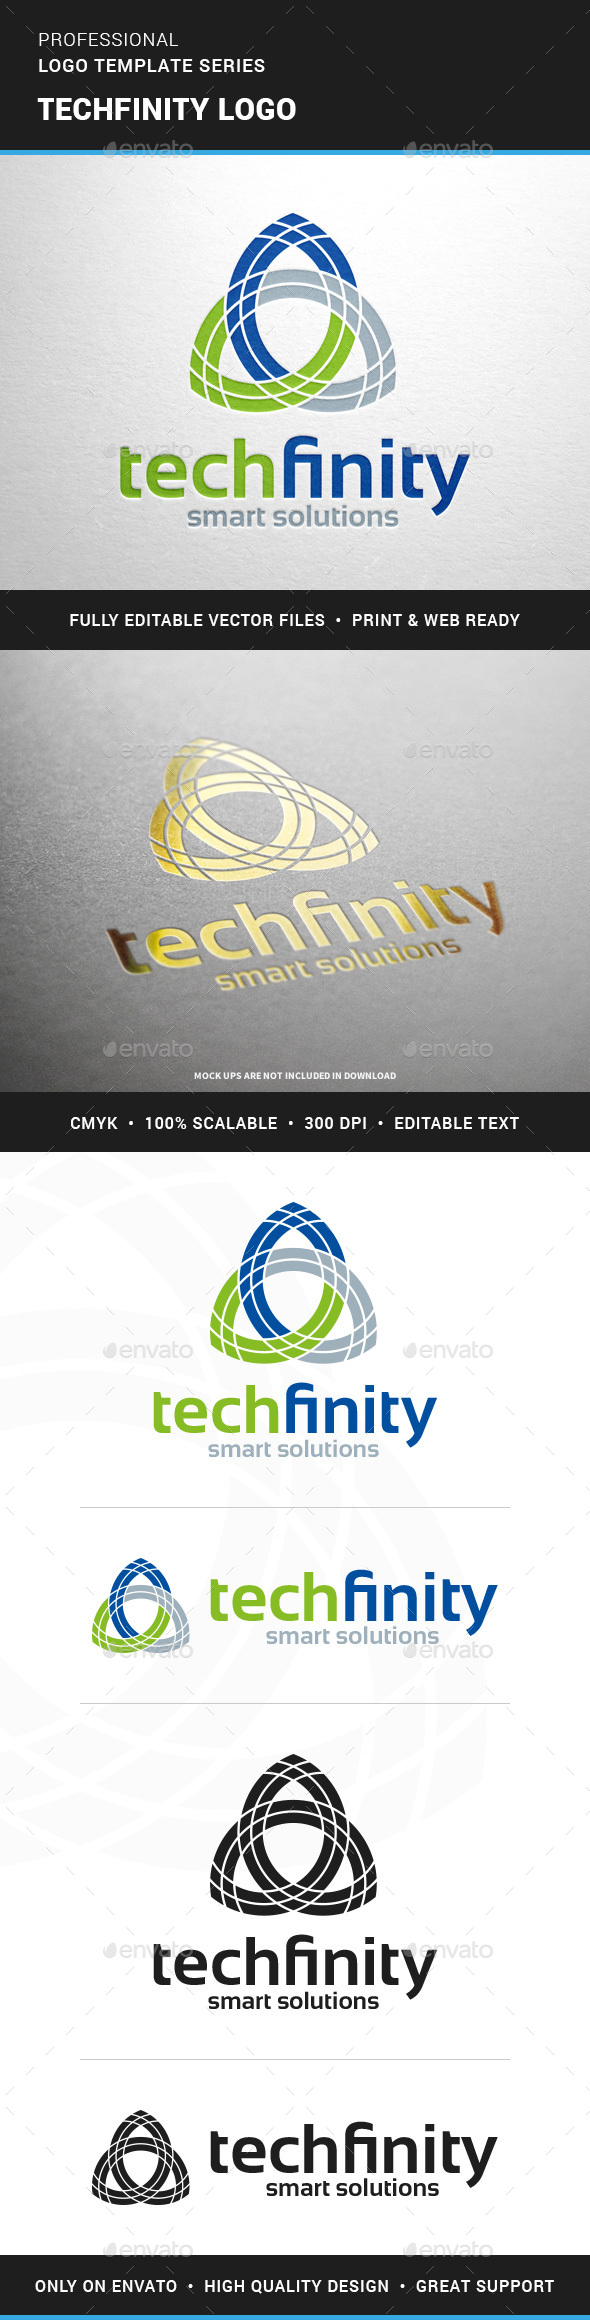 Techfinity Logo Template